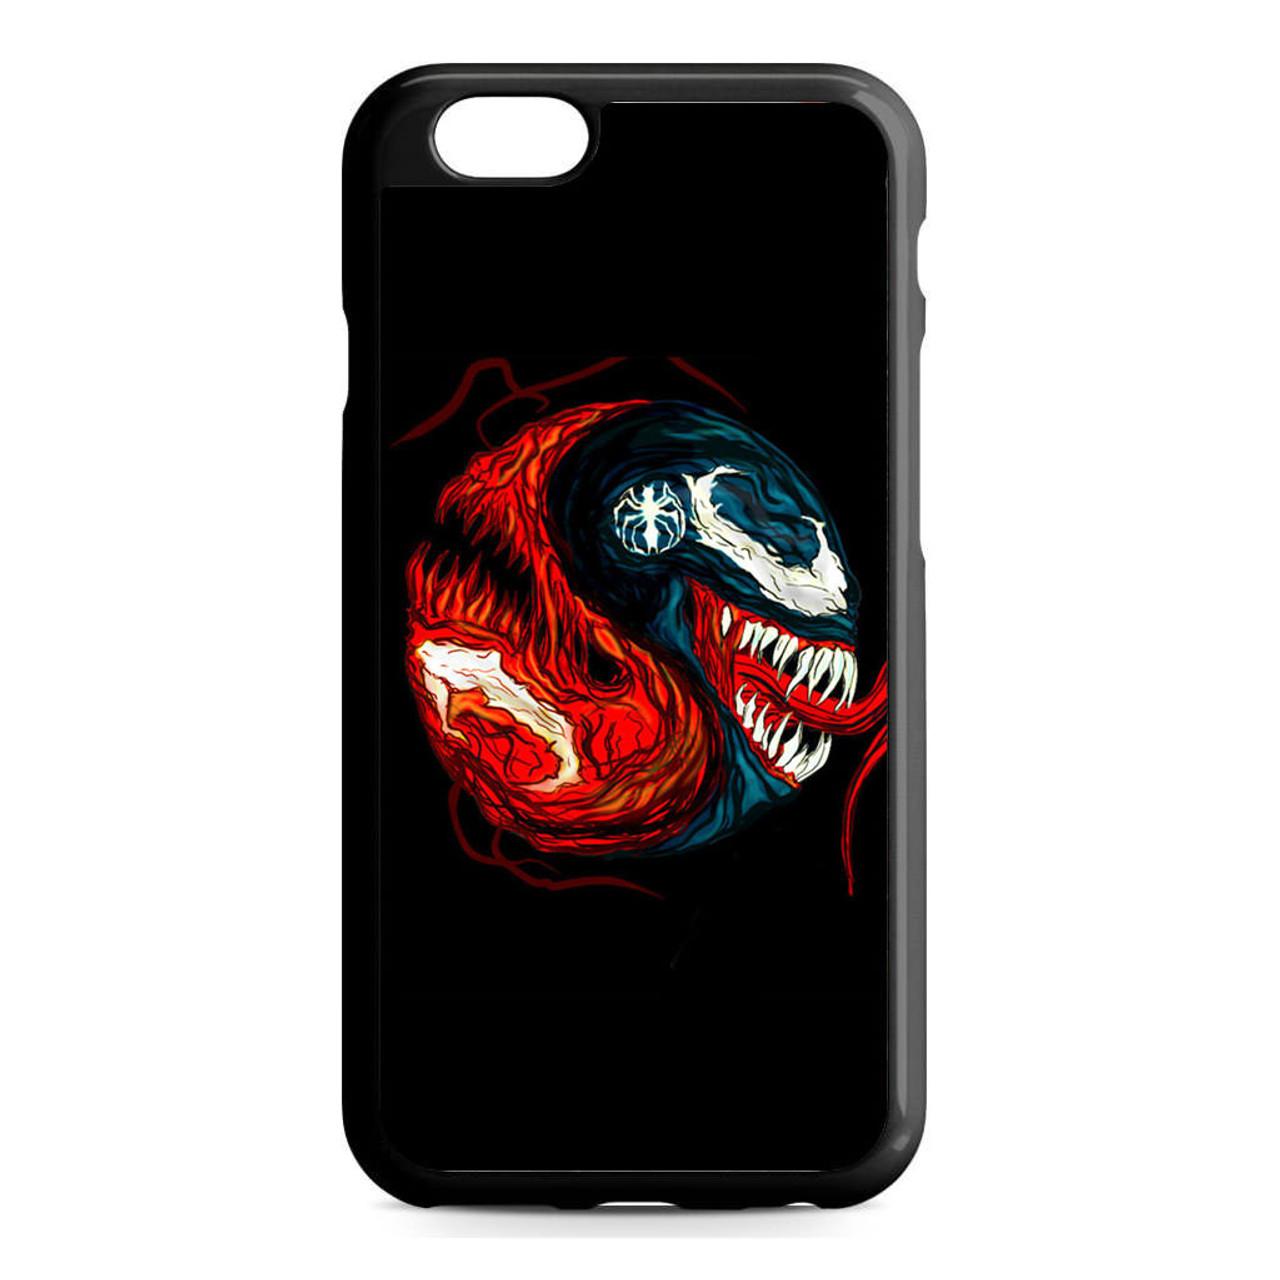 iphone 6 spiderman case